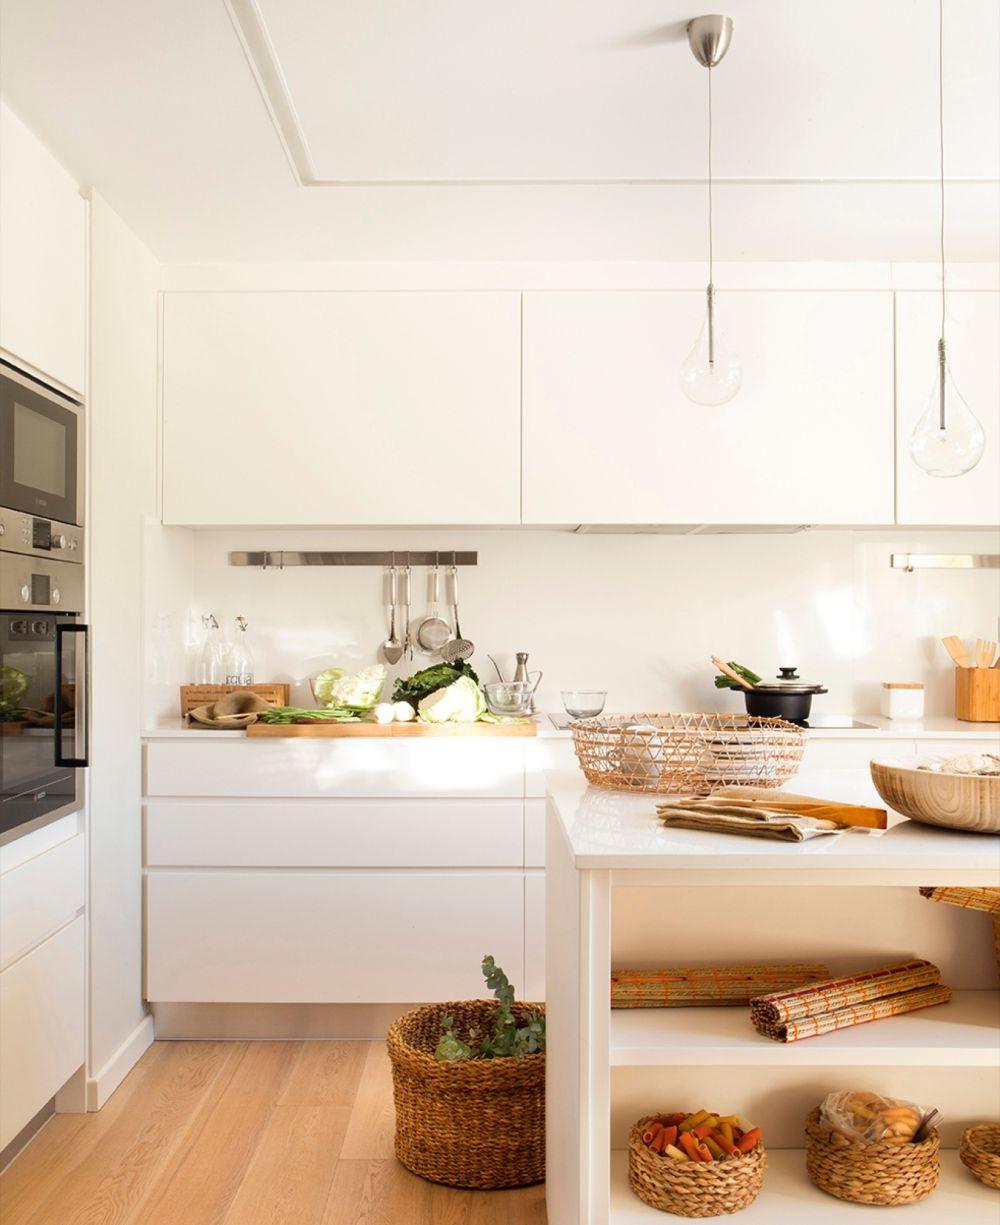 adelaparvu-com-despre-apartament-cald-in-tonuri-neutre-locuinta-spania-design-interior-laura-argelich-si-carla-casanova-foto-jordi-canosa-elmueble-7